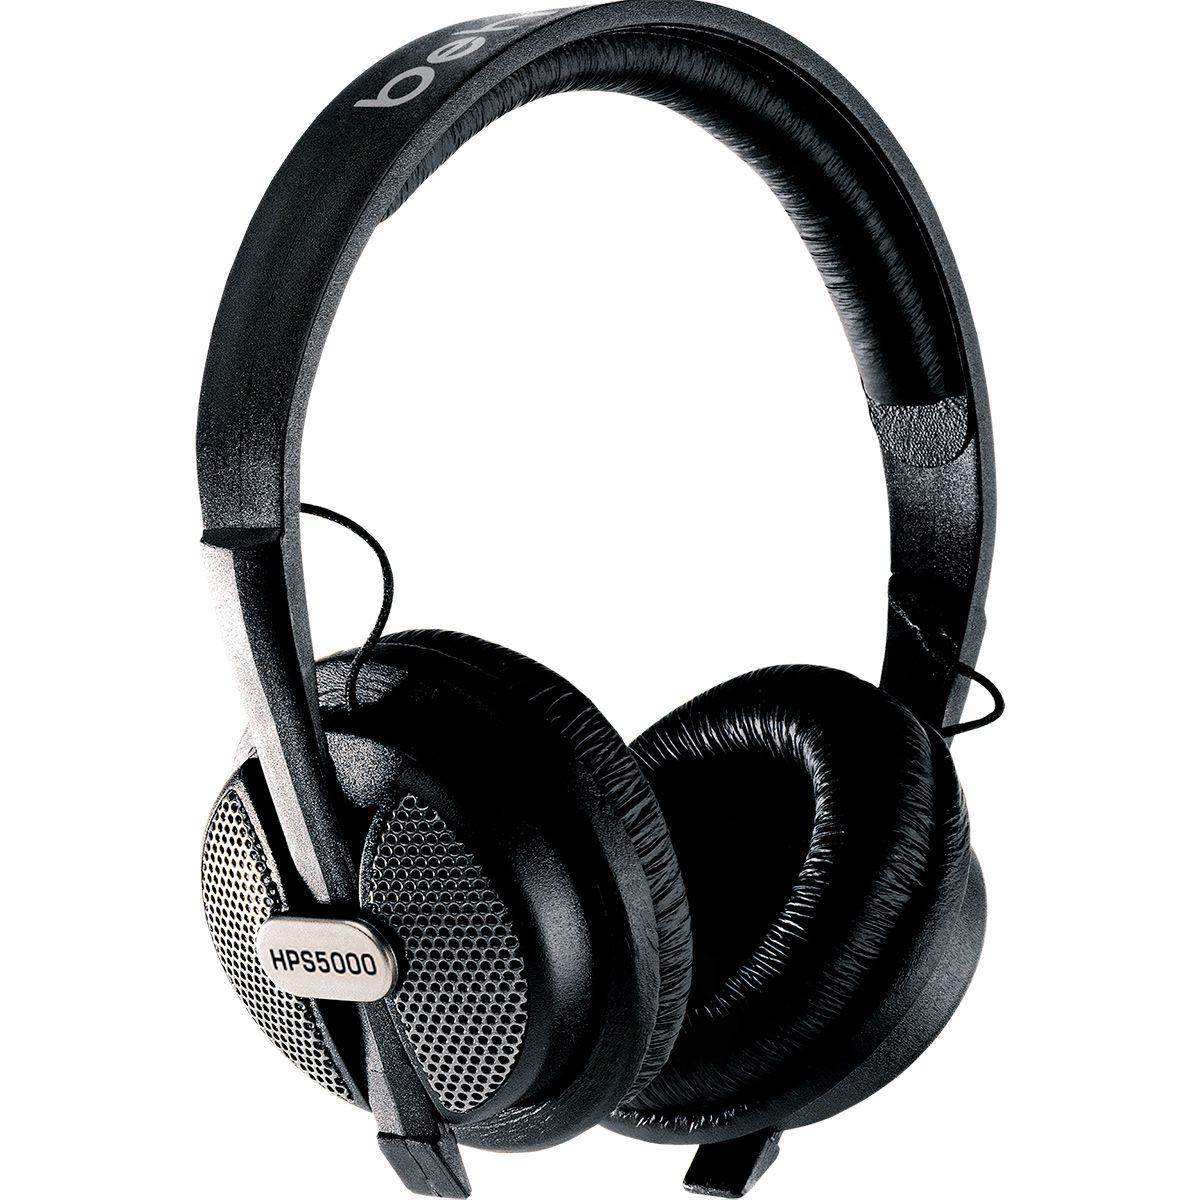 Fone de Ouvido Behringer HPS5000 High Performance Over Ear